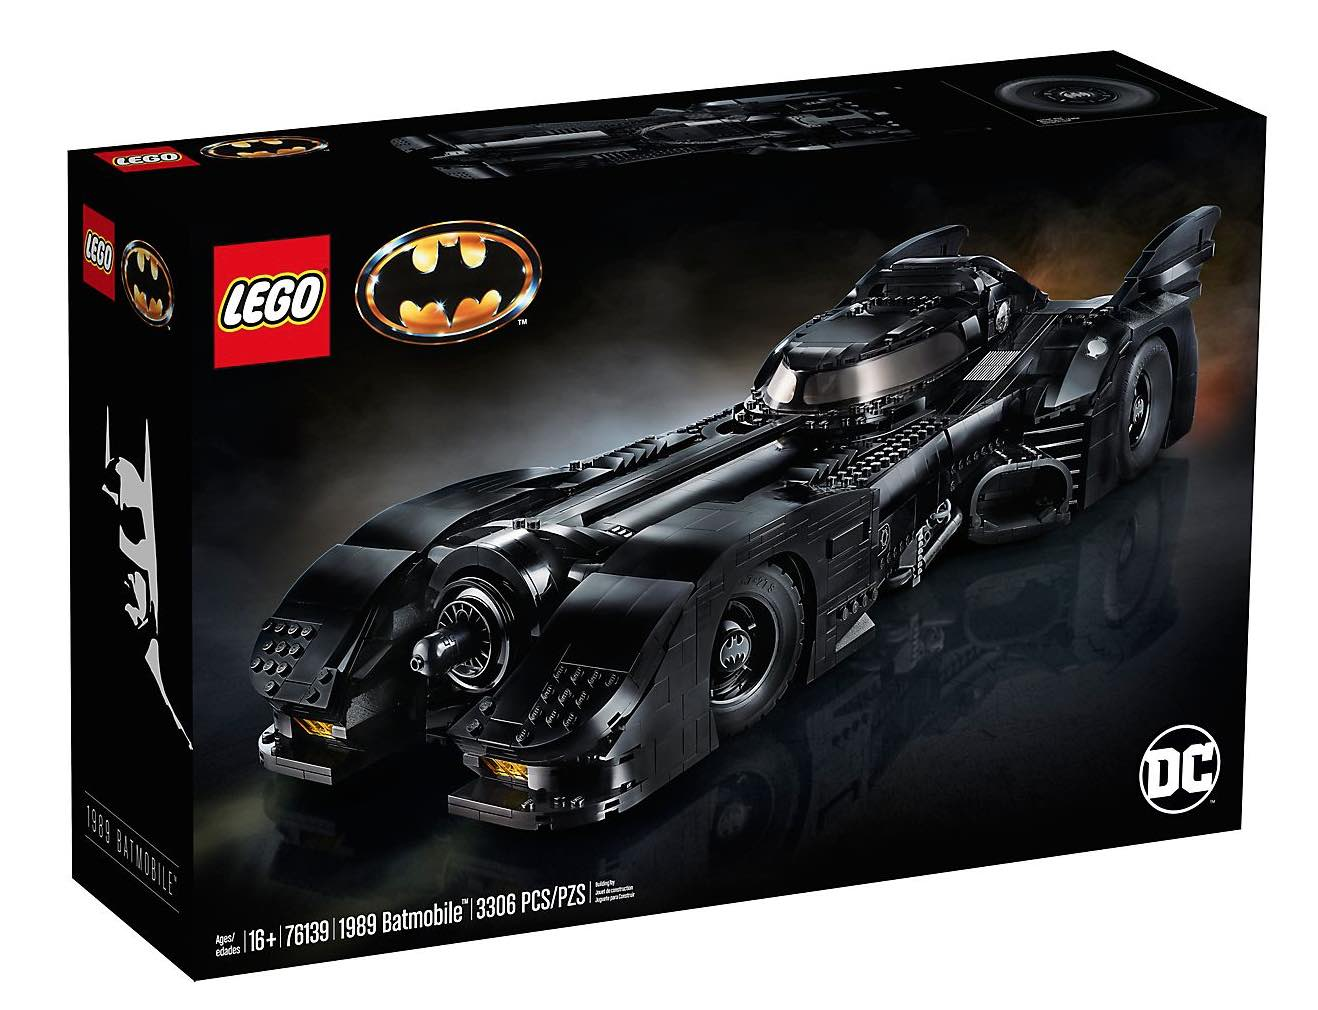 1989 Batmobile box